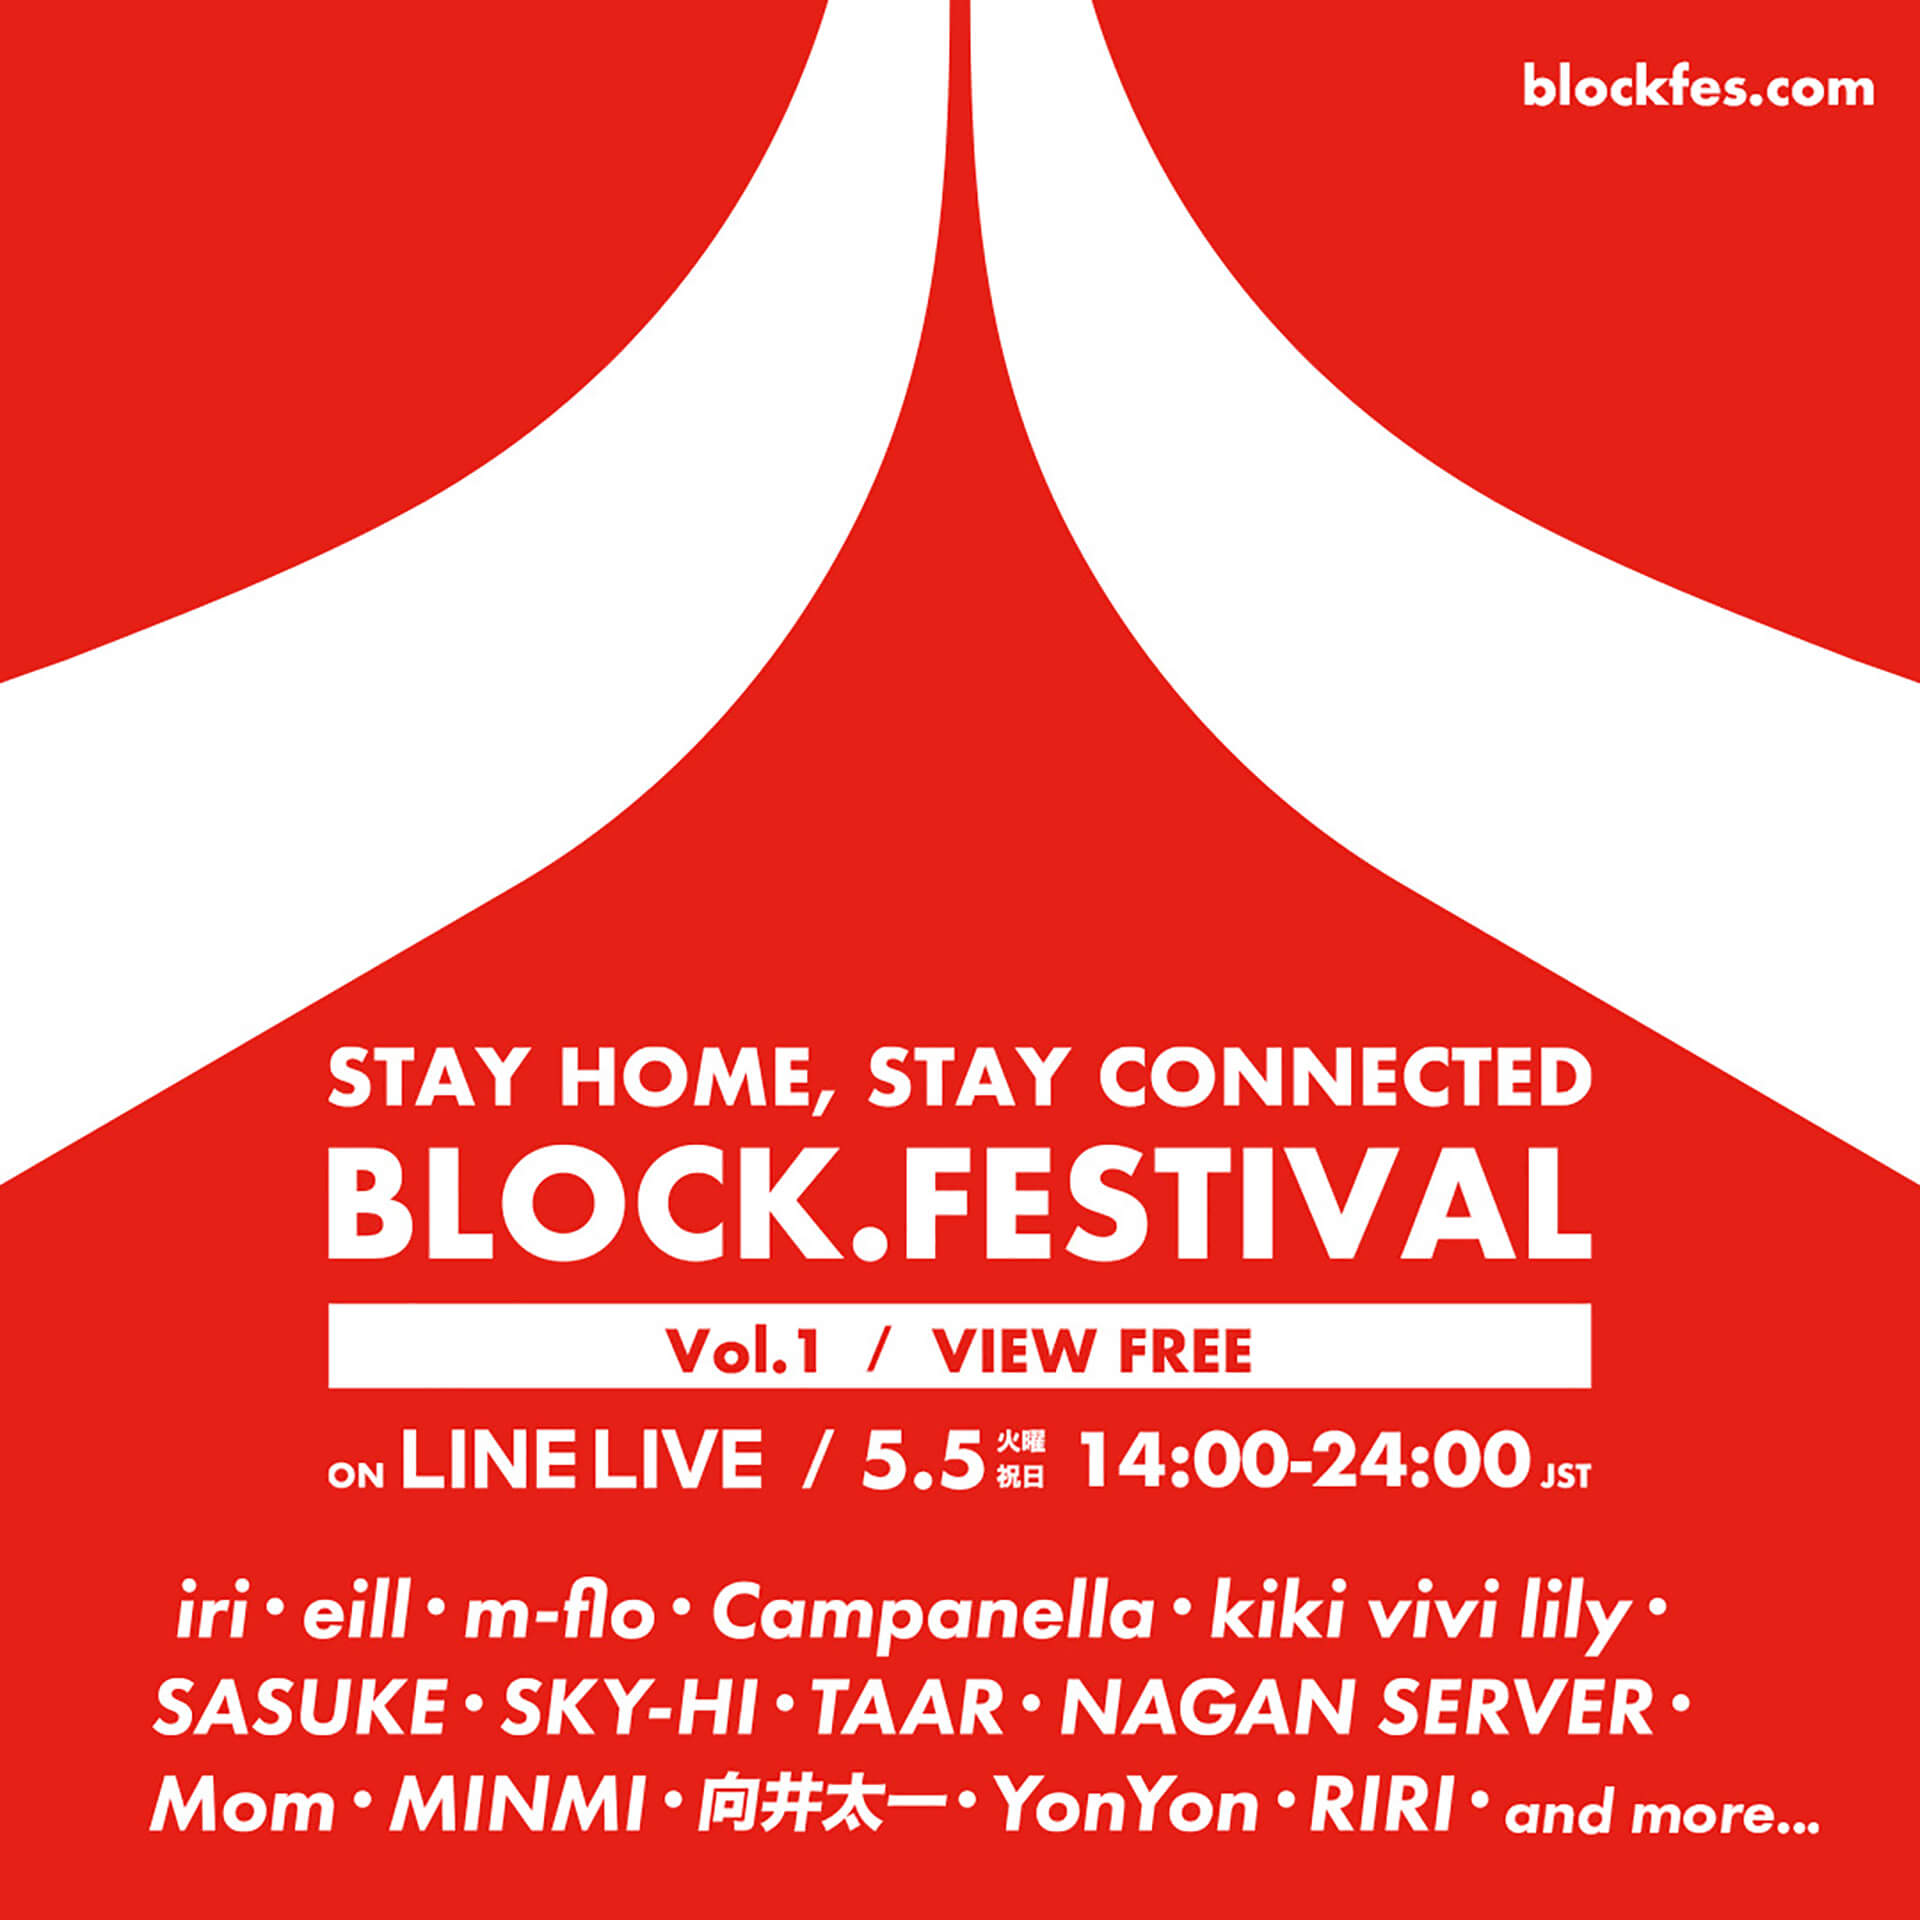 BLOCK.FESTIVAL Vol.1ラインライブ・バナー